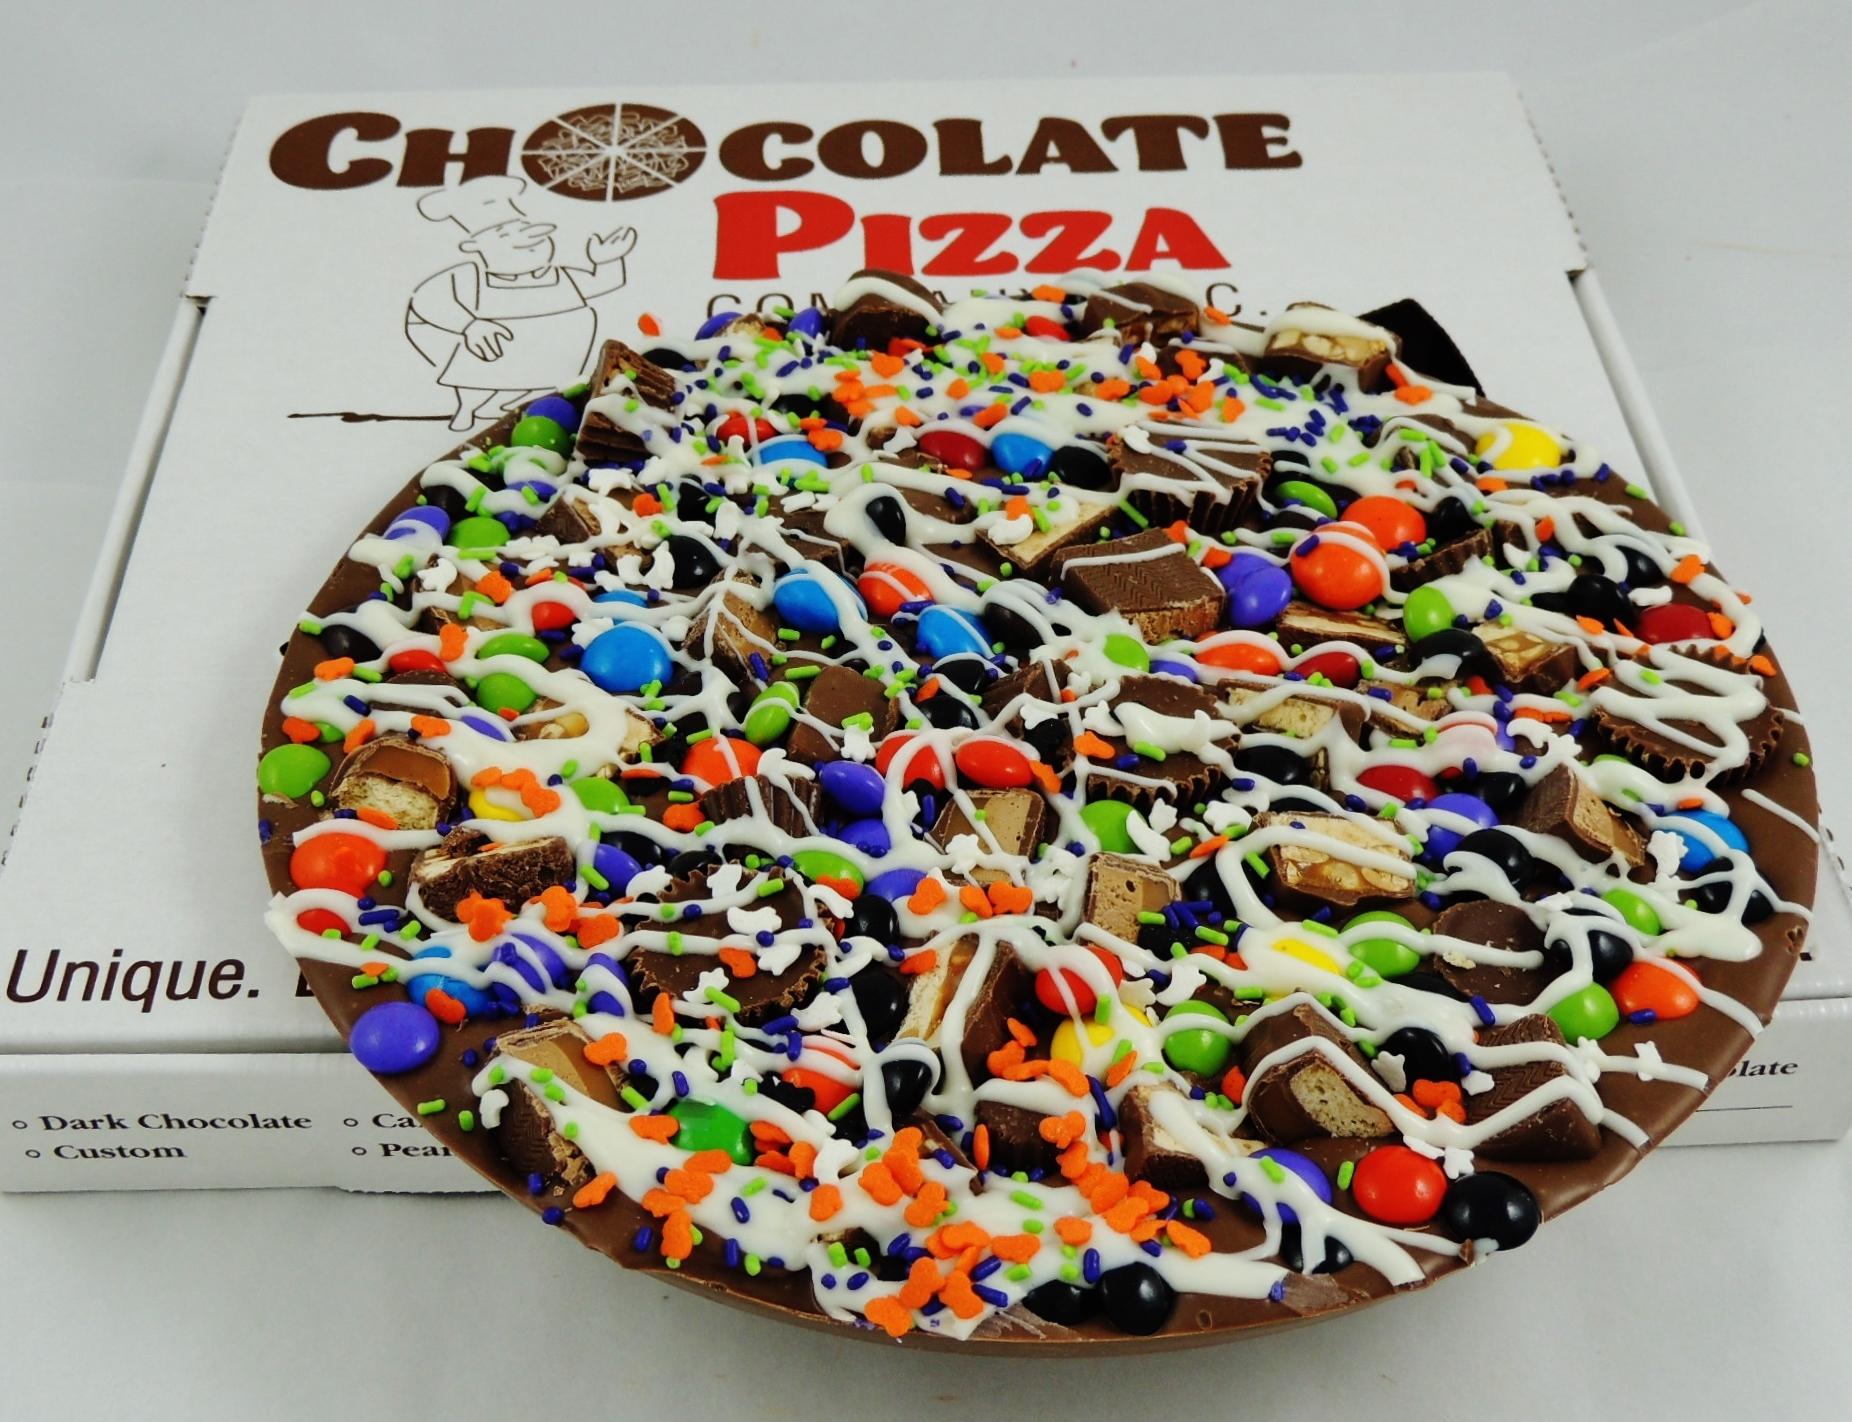 October Avalanche Chocolate Pizza/Chocolate Pizza Company